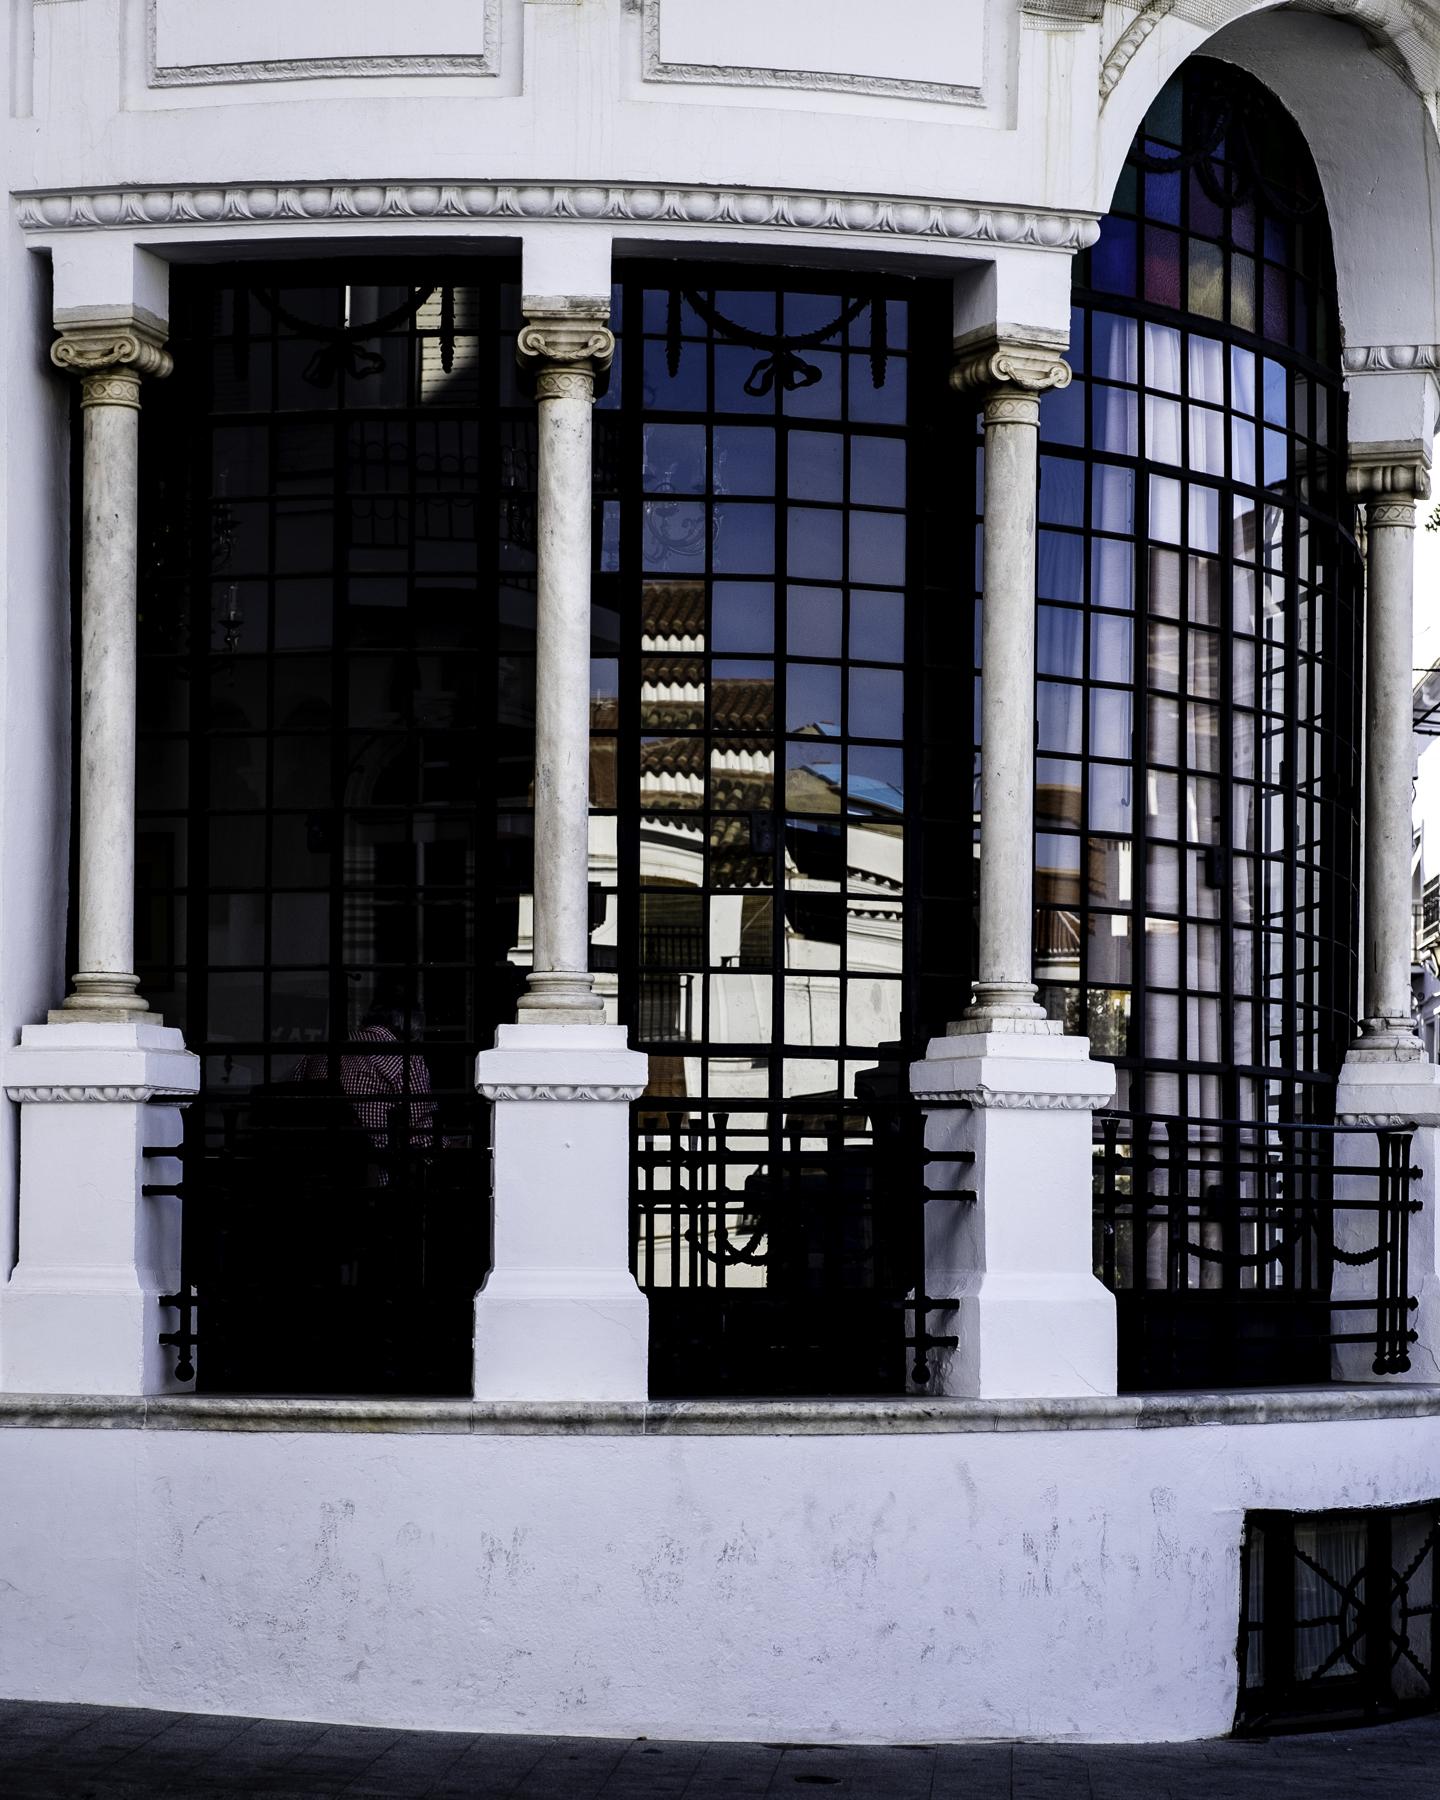 Reflections, Aracena